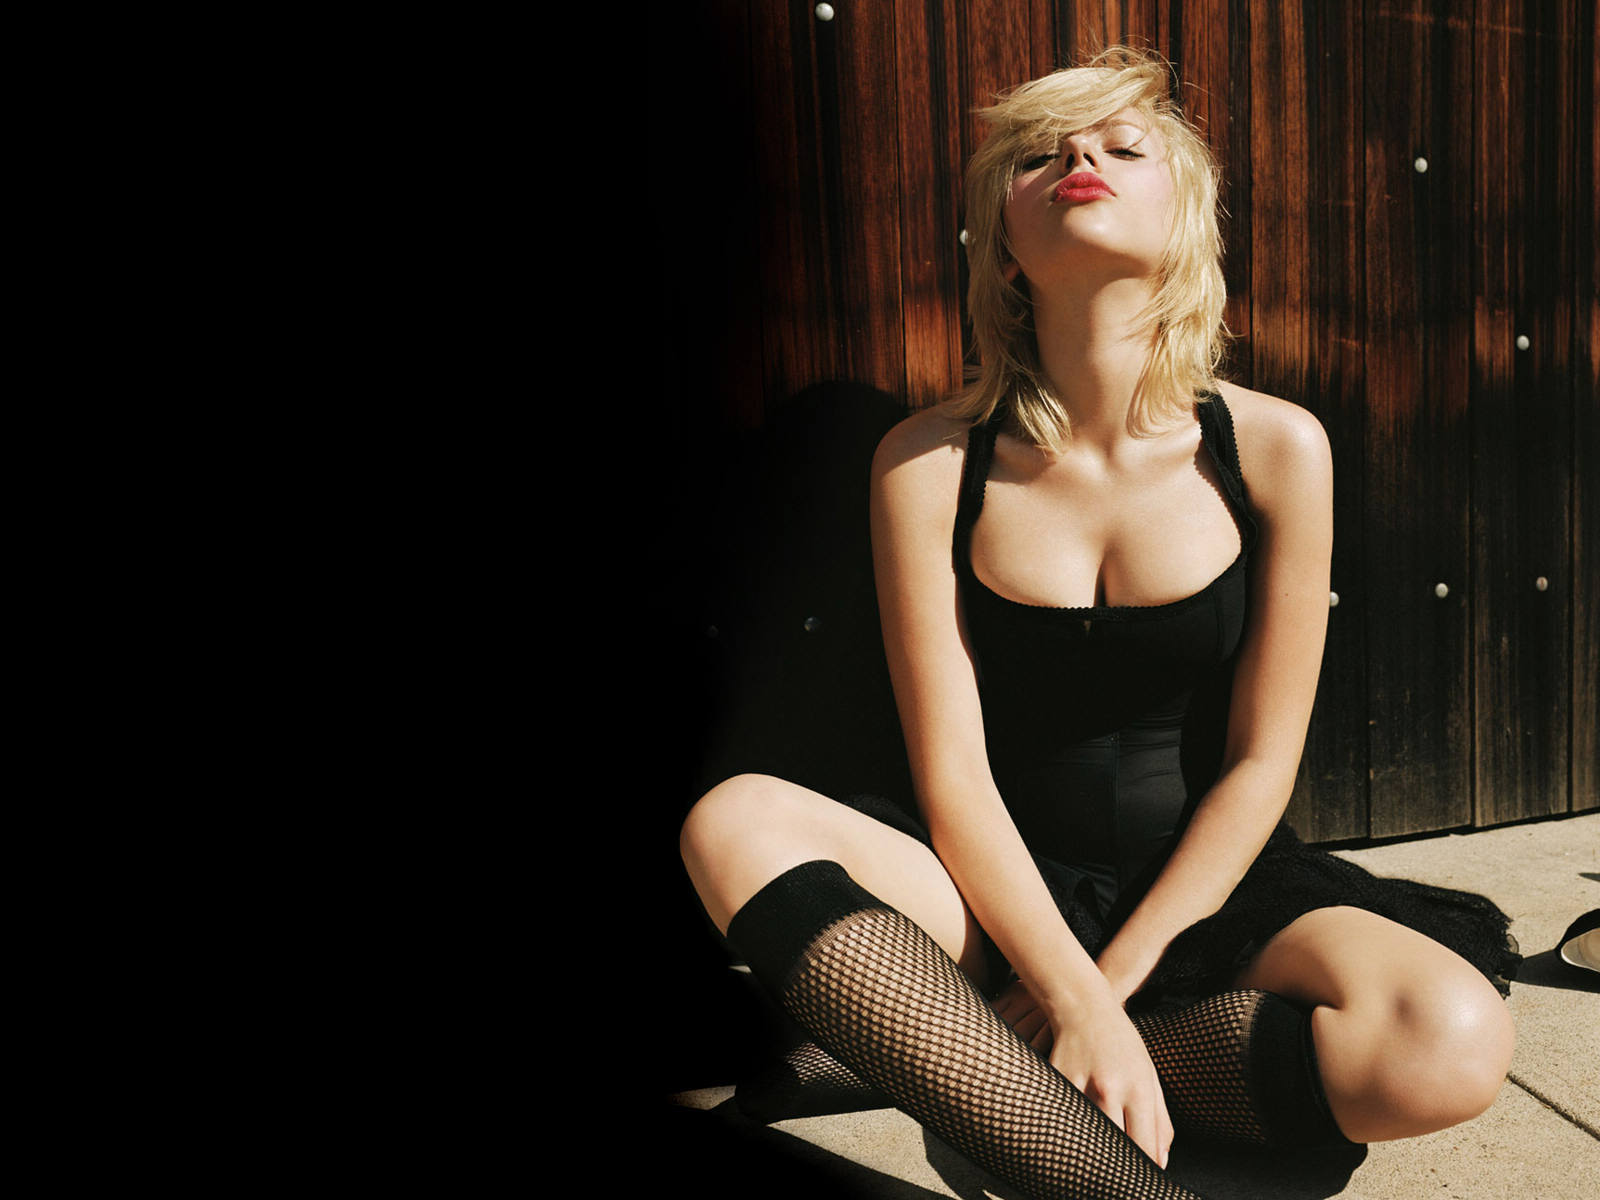 Scarlett Johansson - S... Maggie Gyllenhaal Imdb